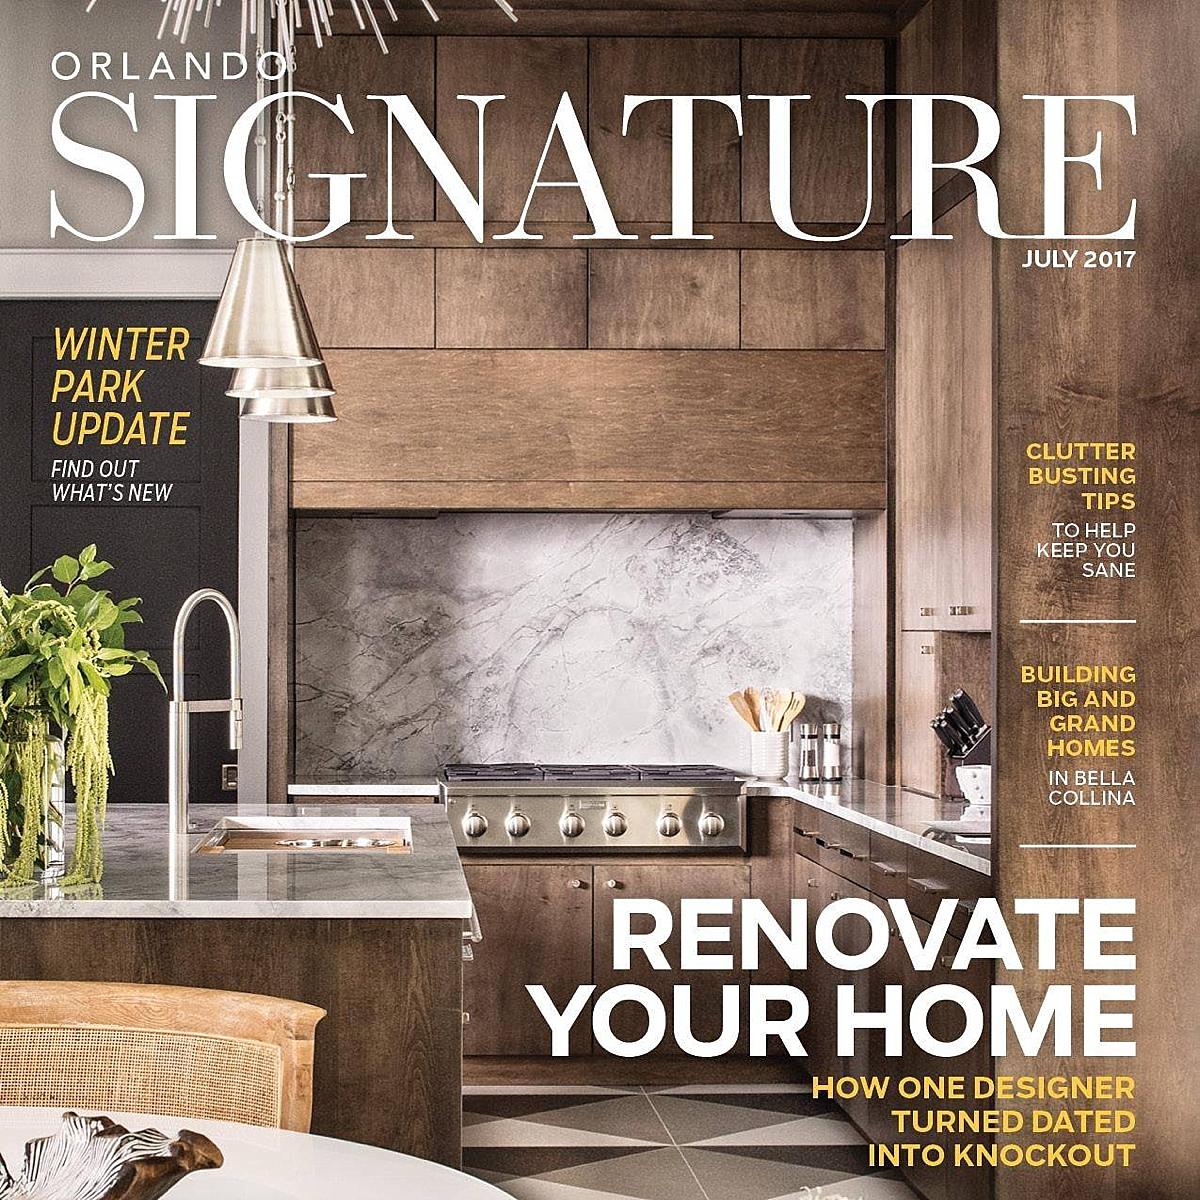 Orlando Signature Home Renovation Reinvented Brianna Michelle Design